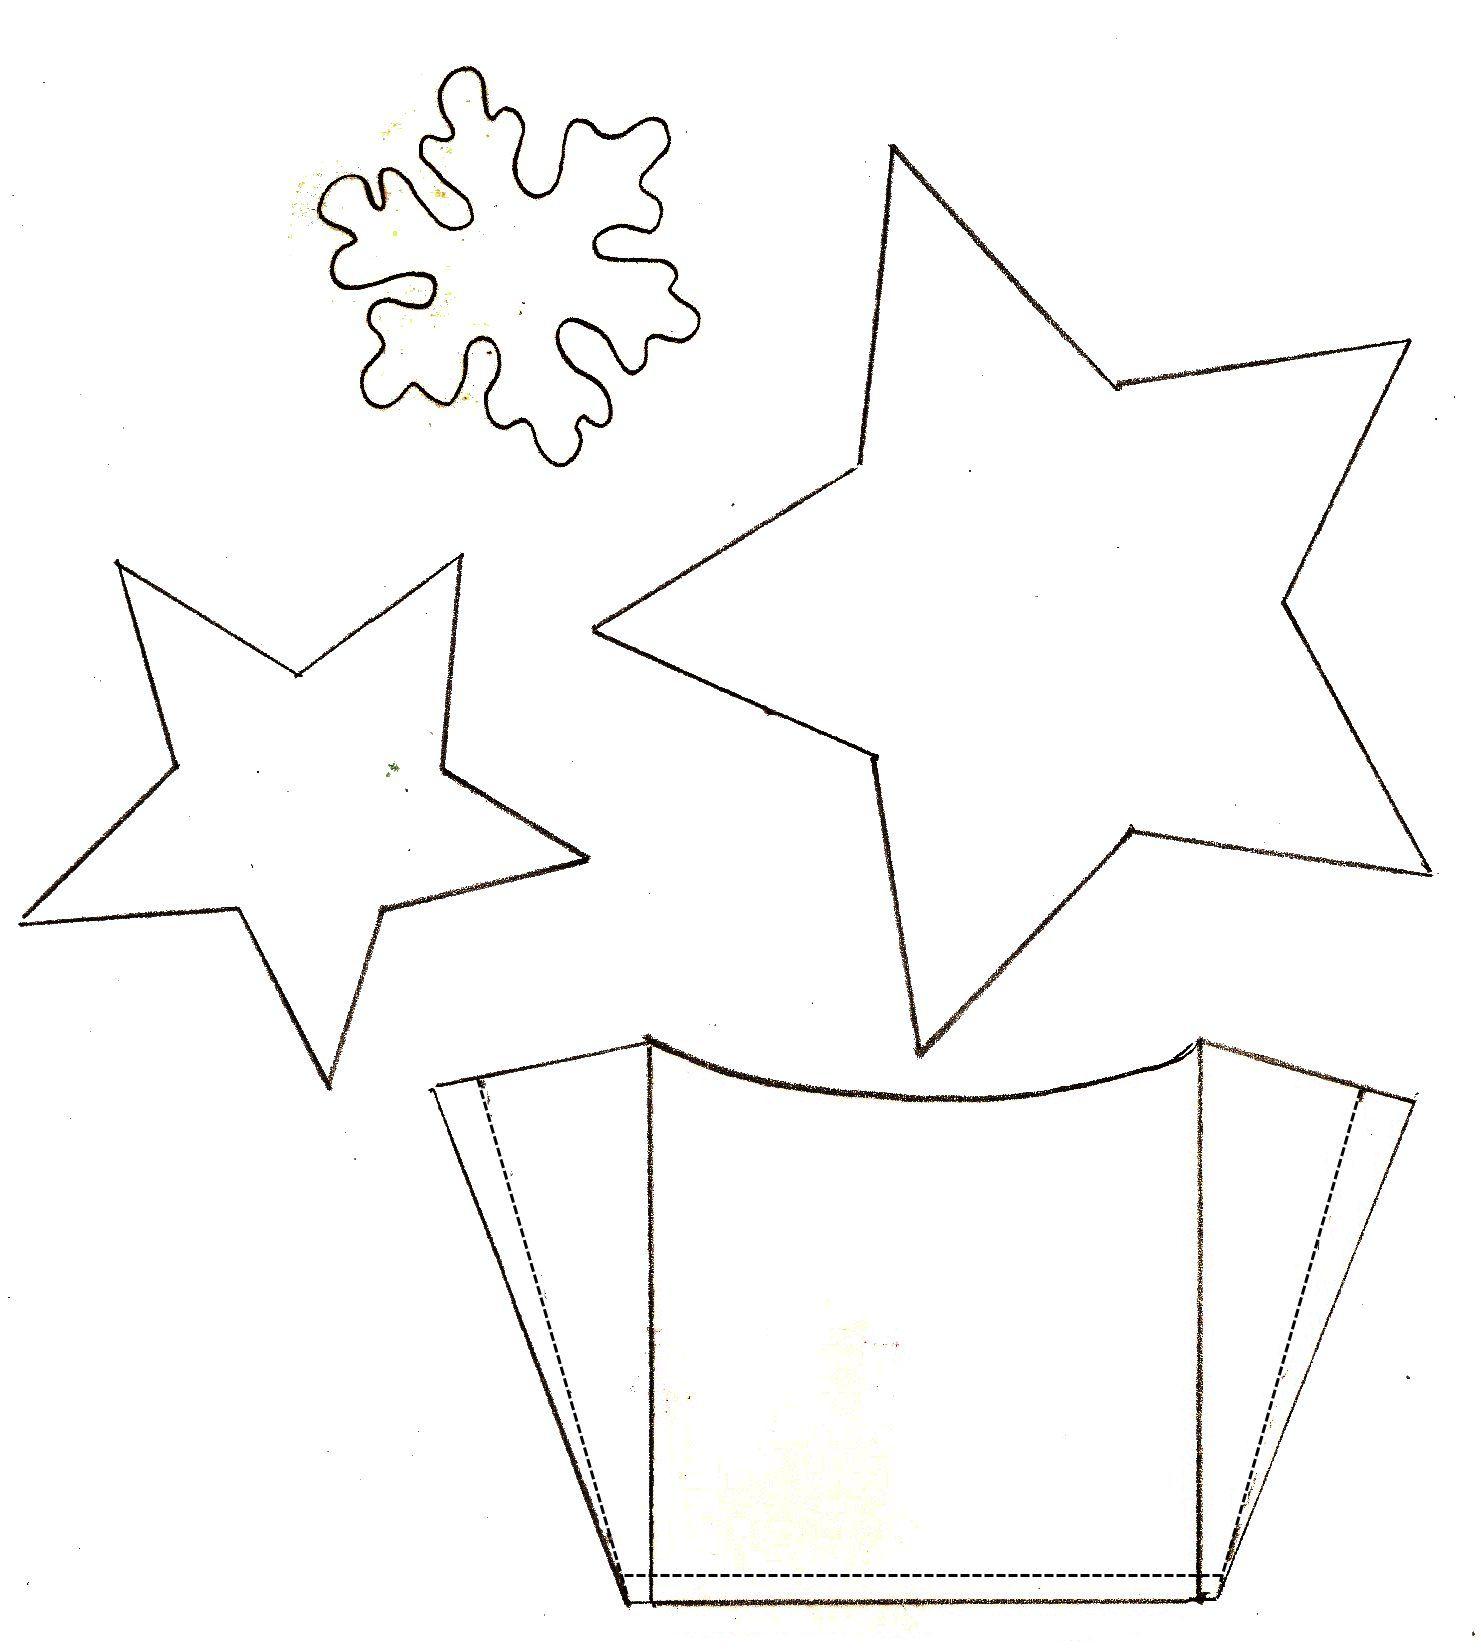 Gabarit - Calendrier De L'avent Sapin De Noël concernant Gabarit Sapin De Noel